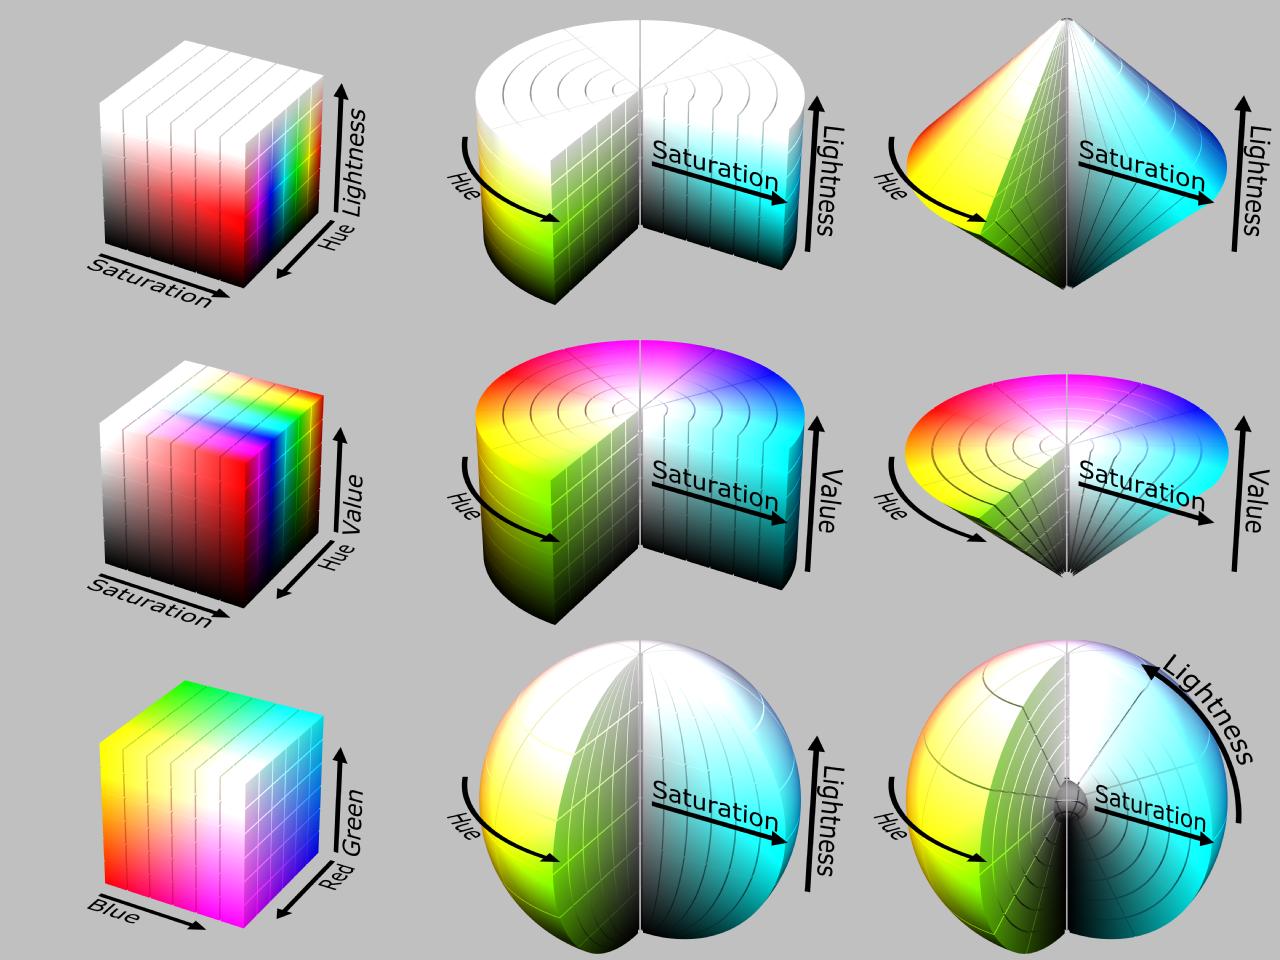 Color solid comparison hsl hsv rgb cone sphere cube cylinderg color solid comparison hsl hsv rgb cone sphere cube cylinderg geenschuldenfo Choice Image